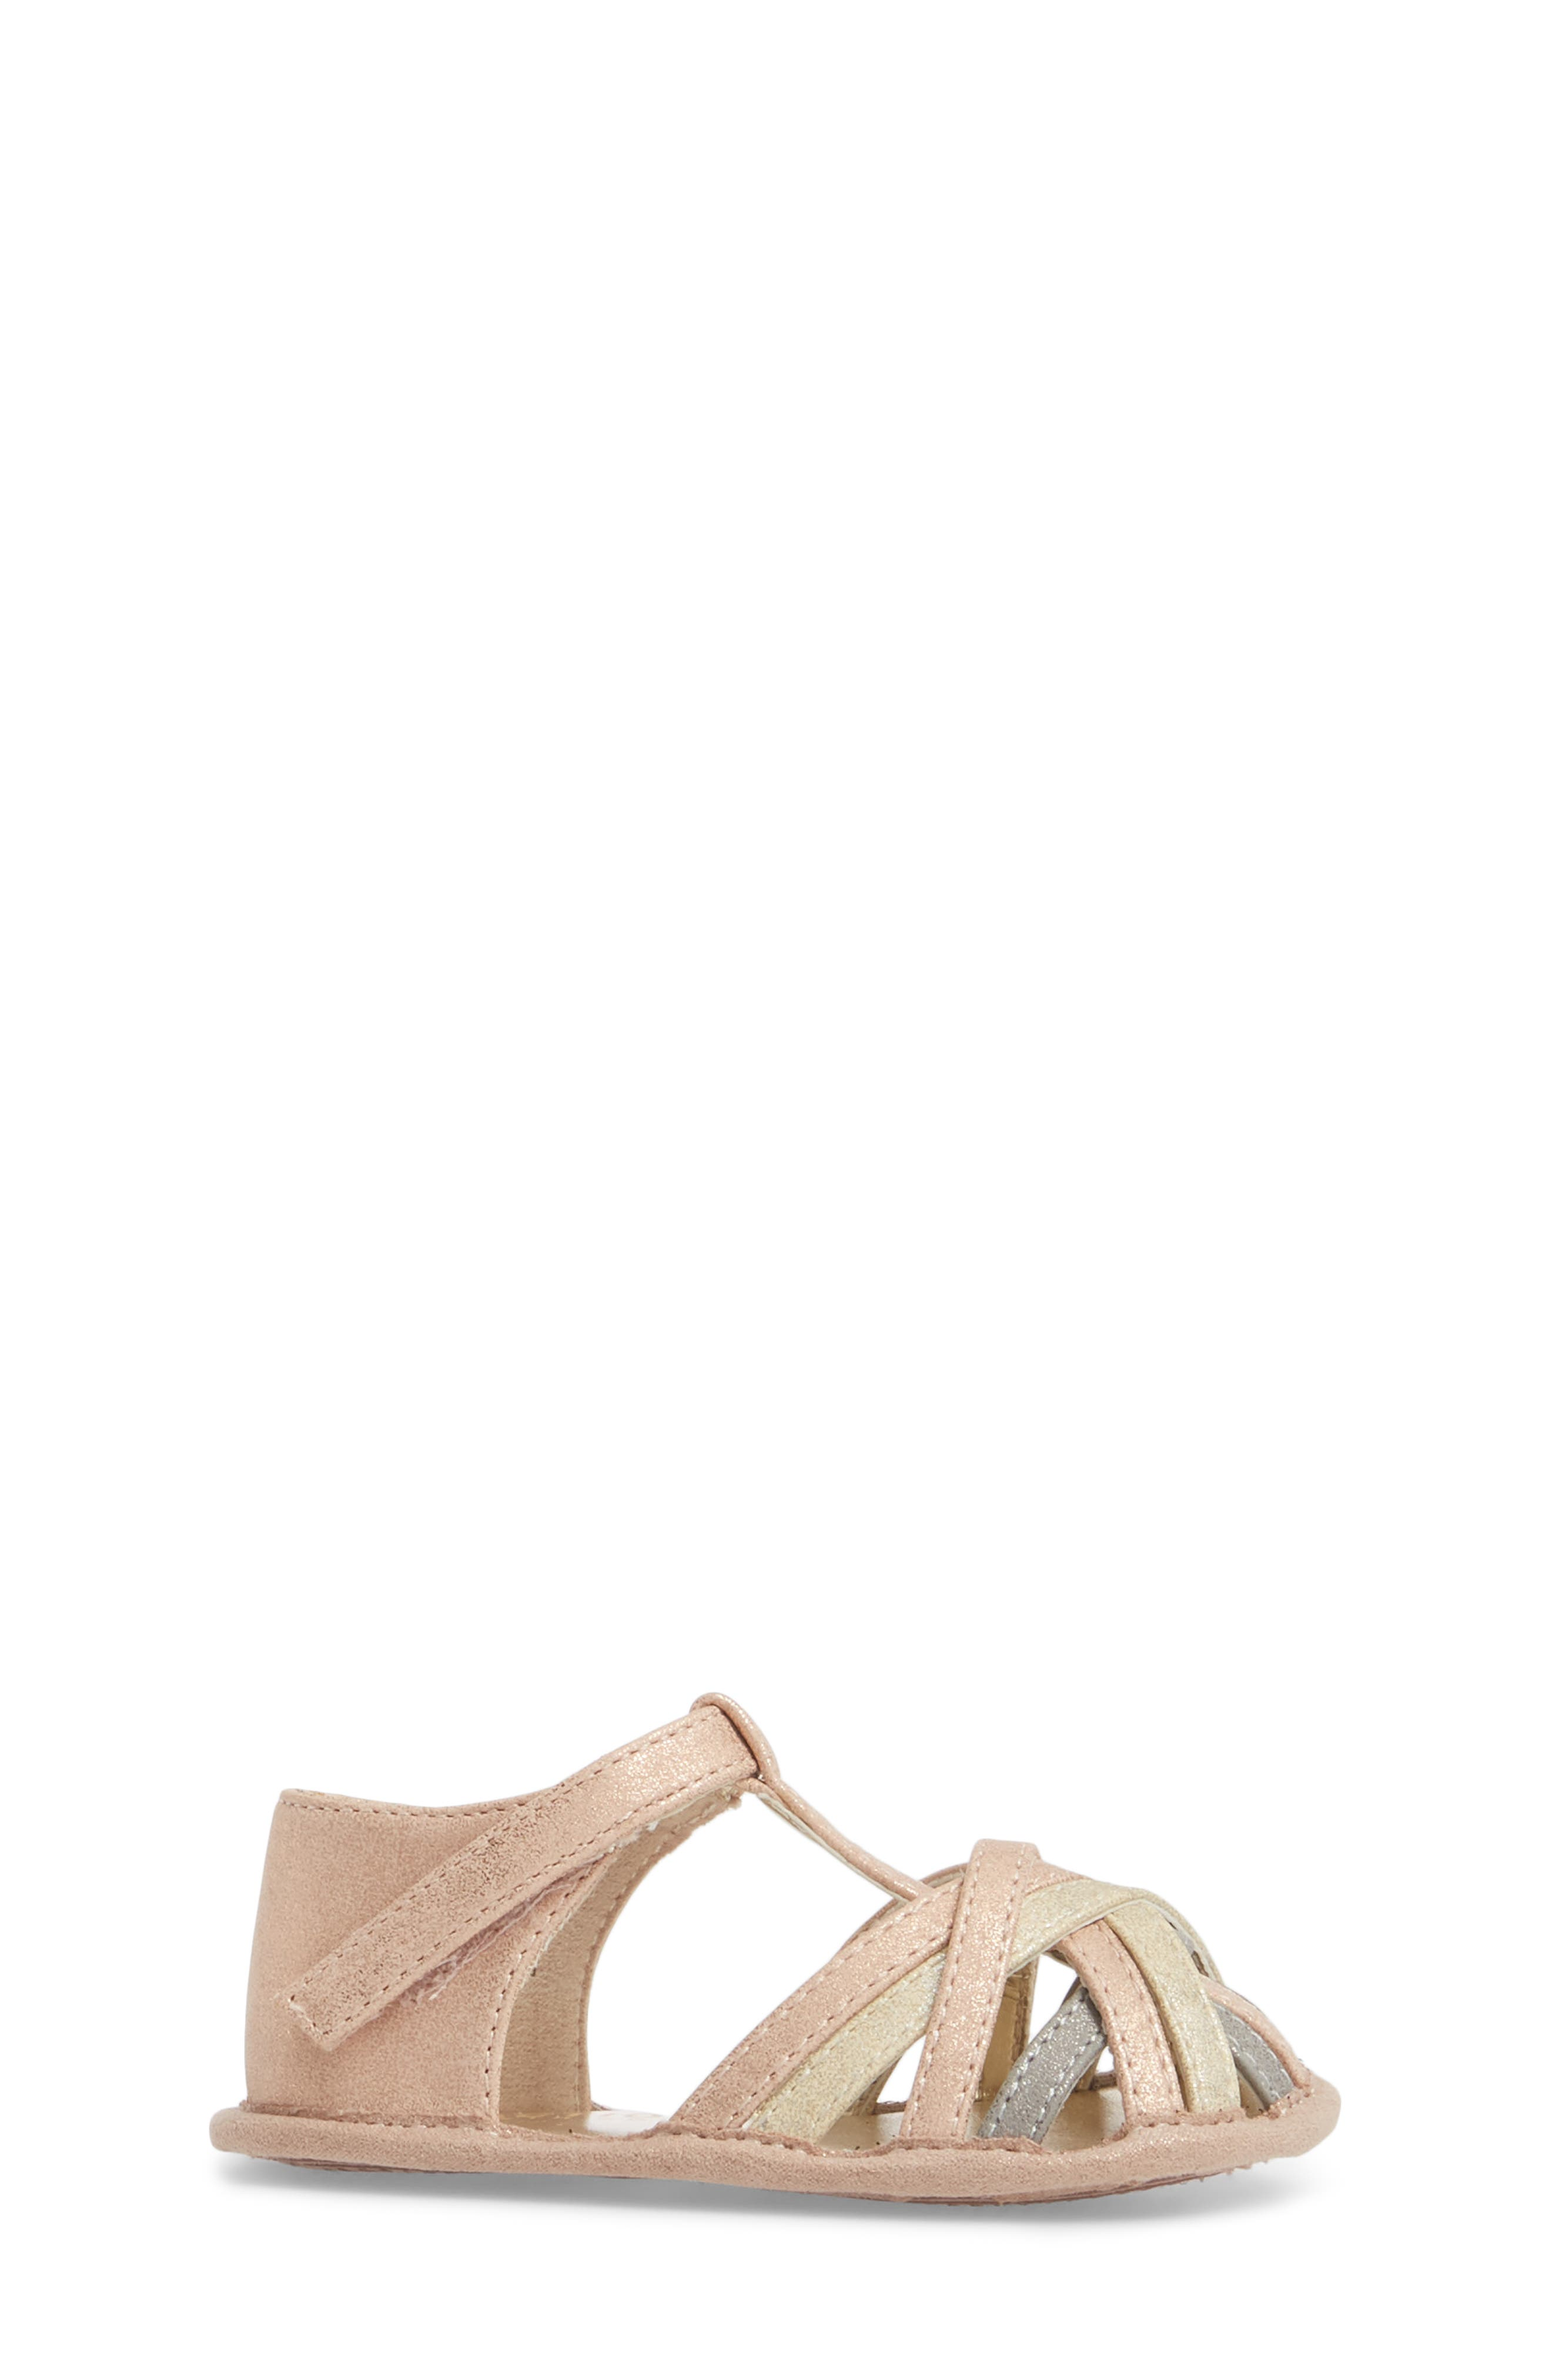 Wisp Metallic Sandal,                             Alternate thumbnail 3, color,                             Rose Gold